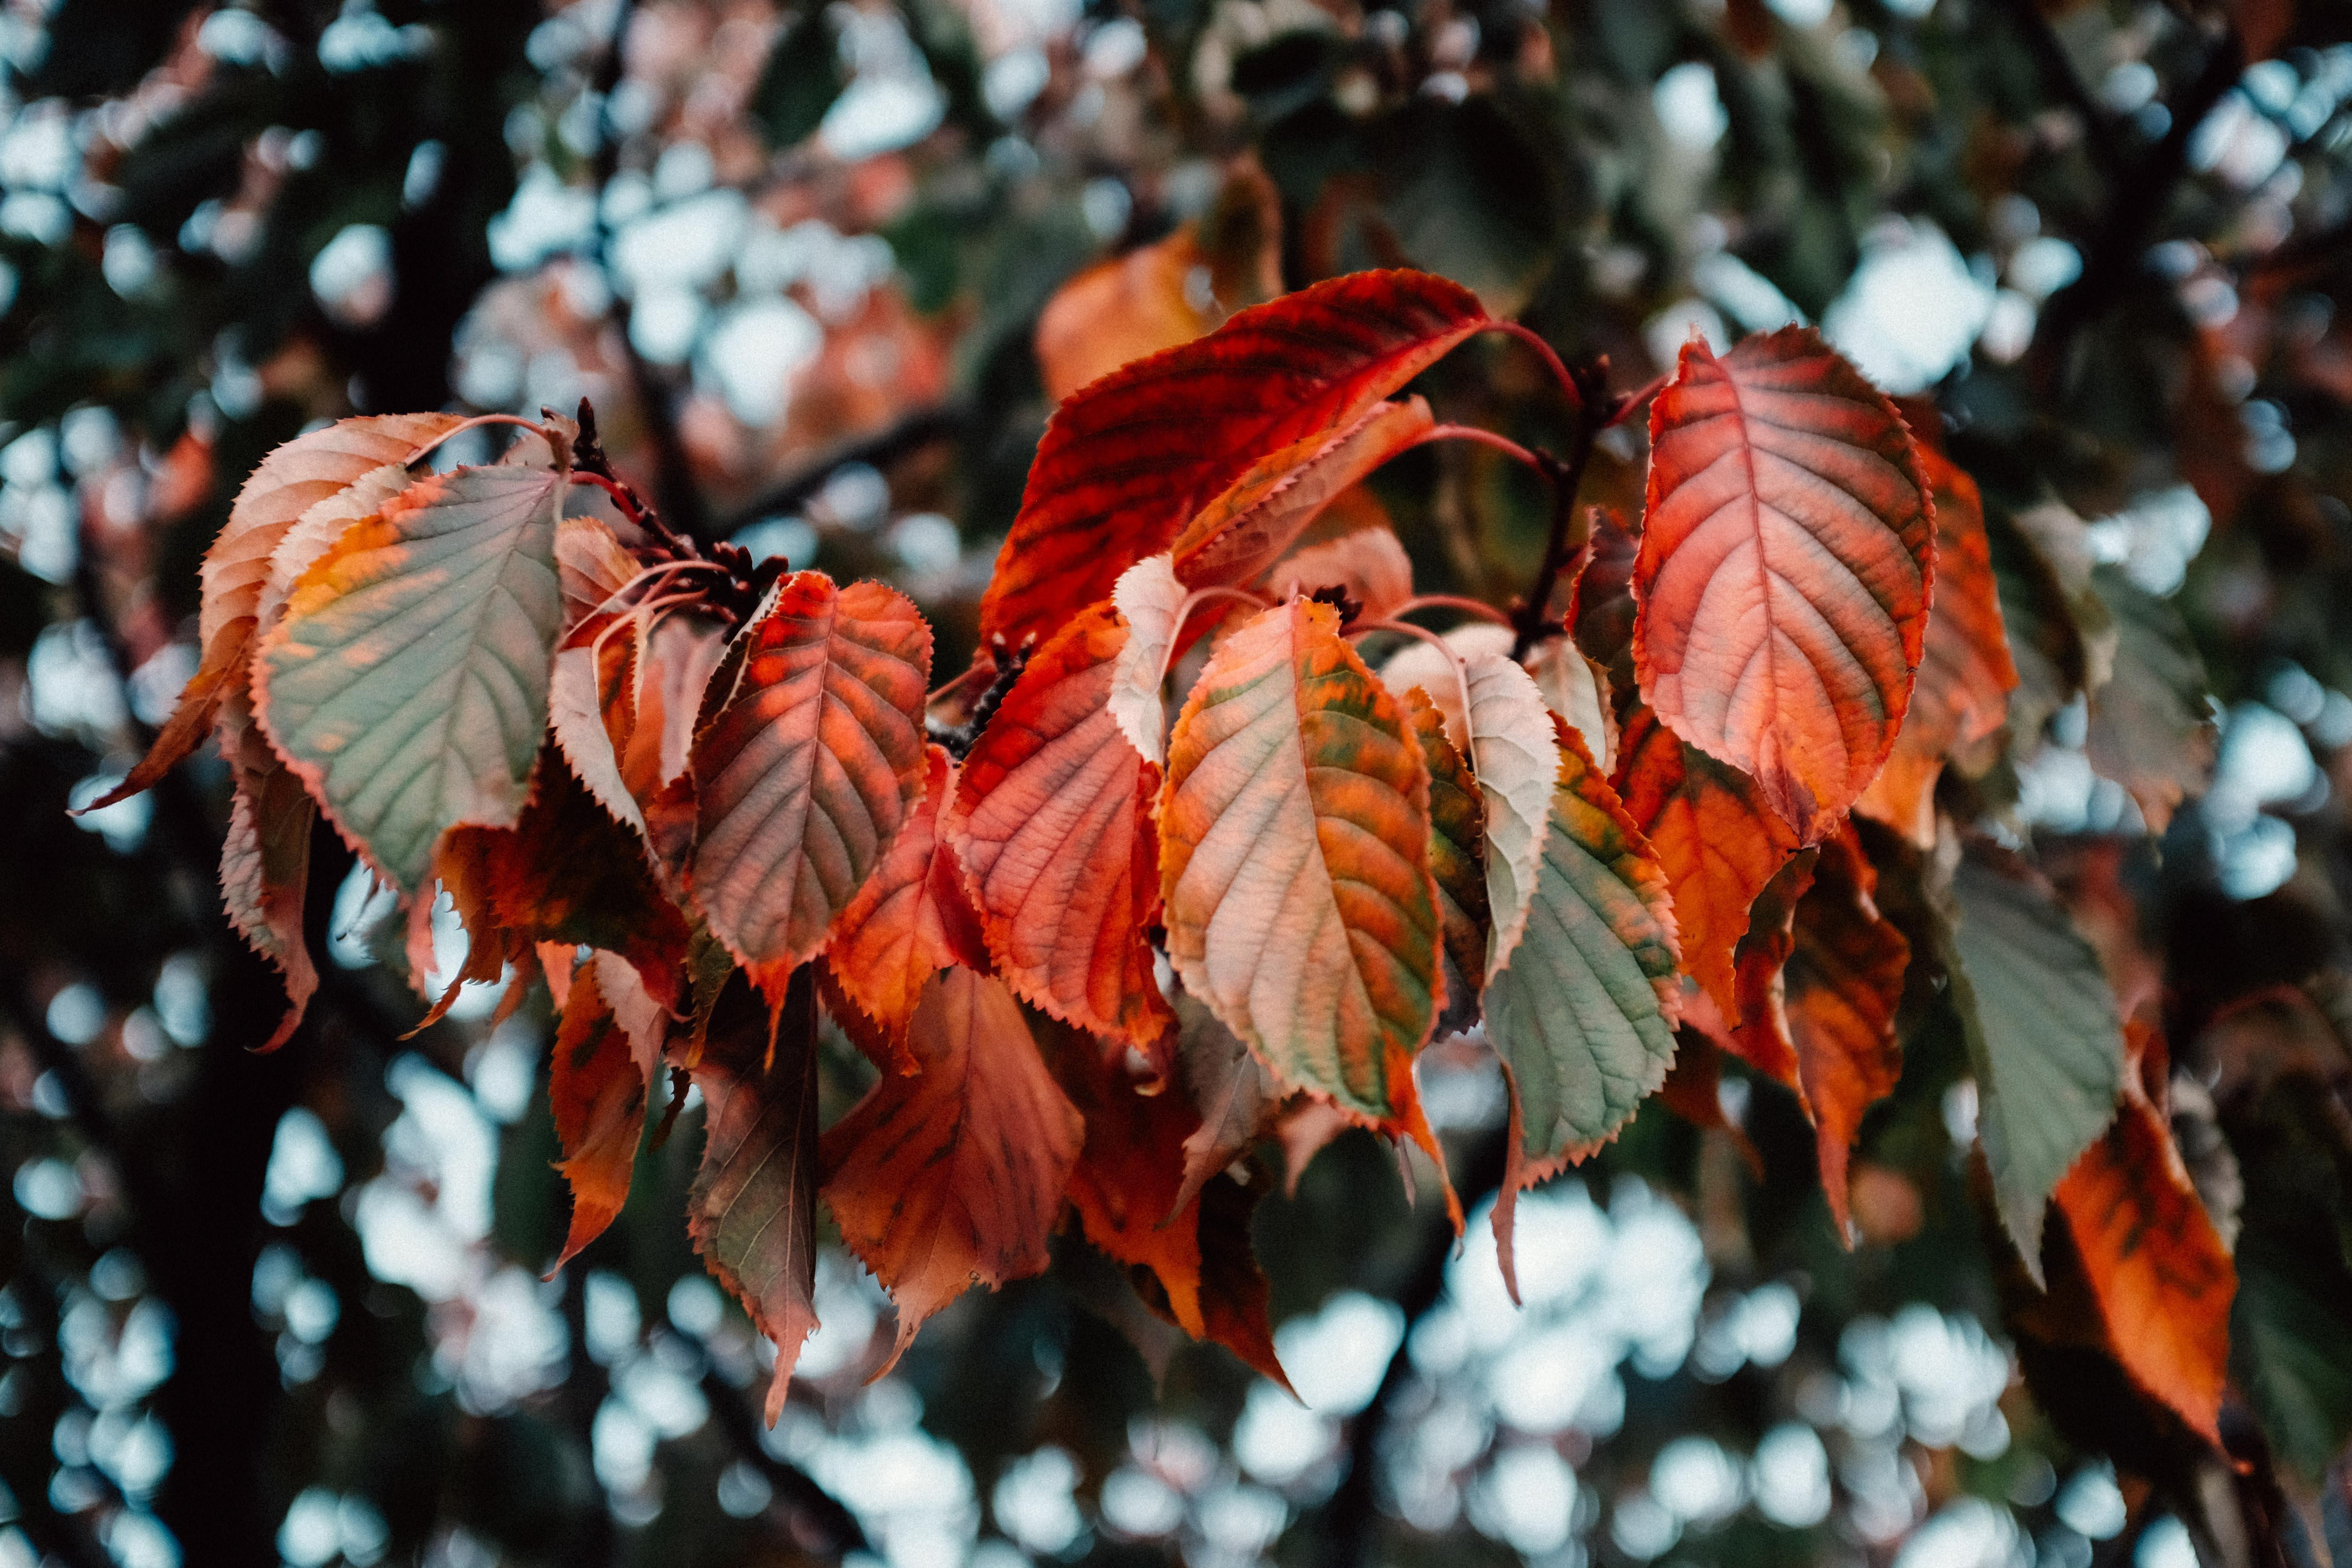 red leaf during daytime